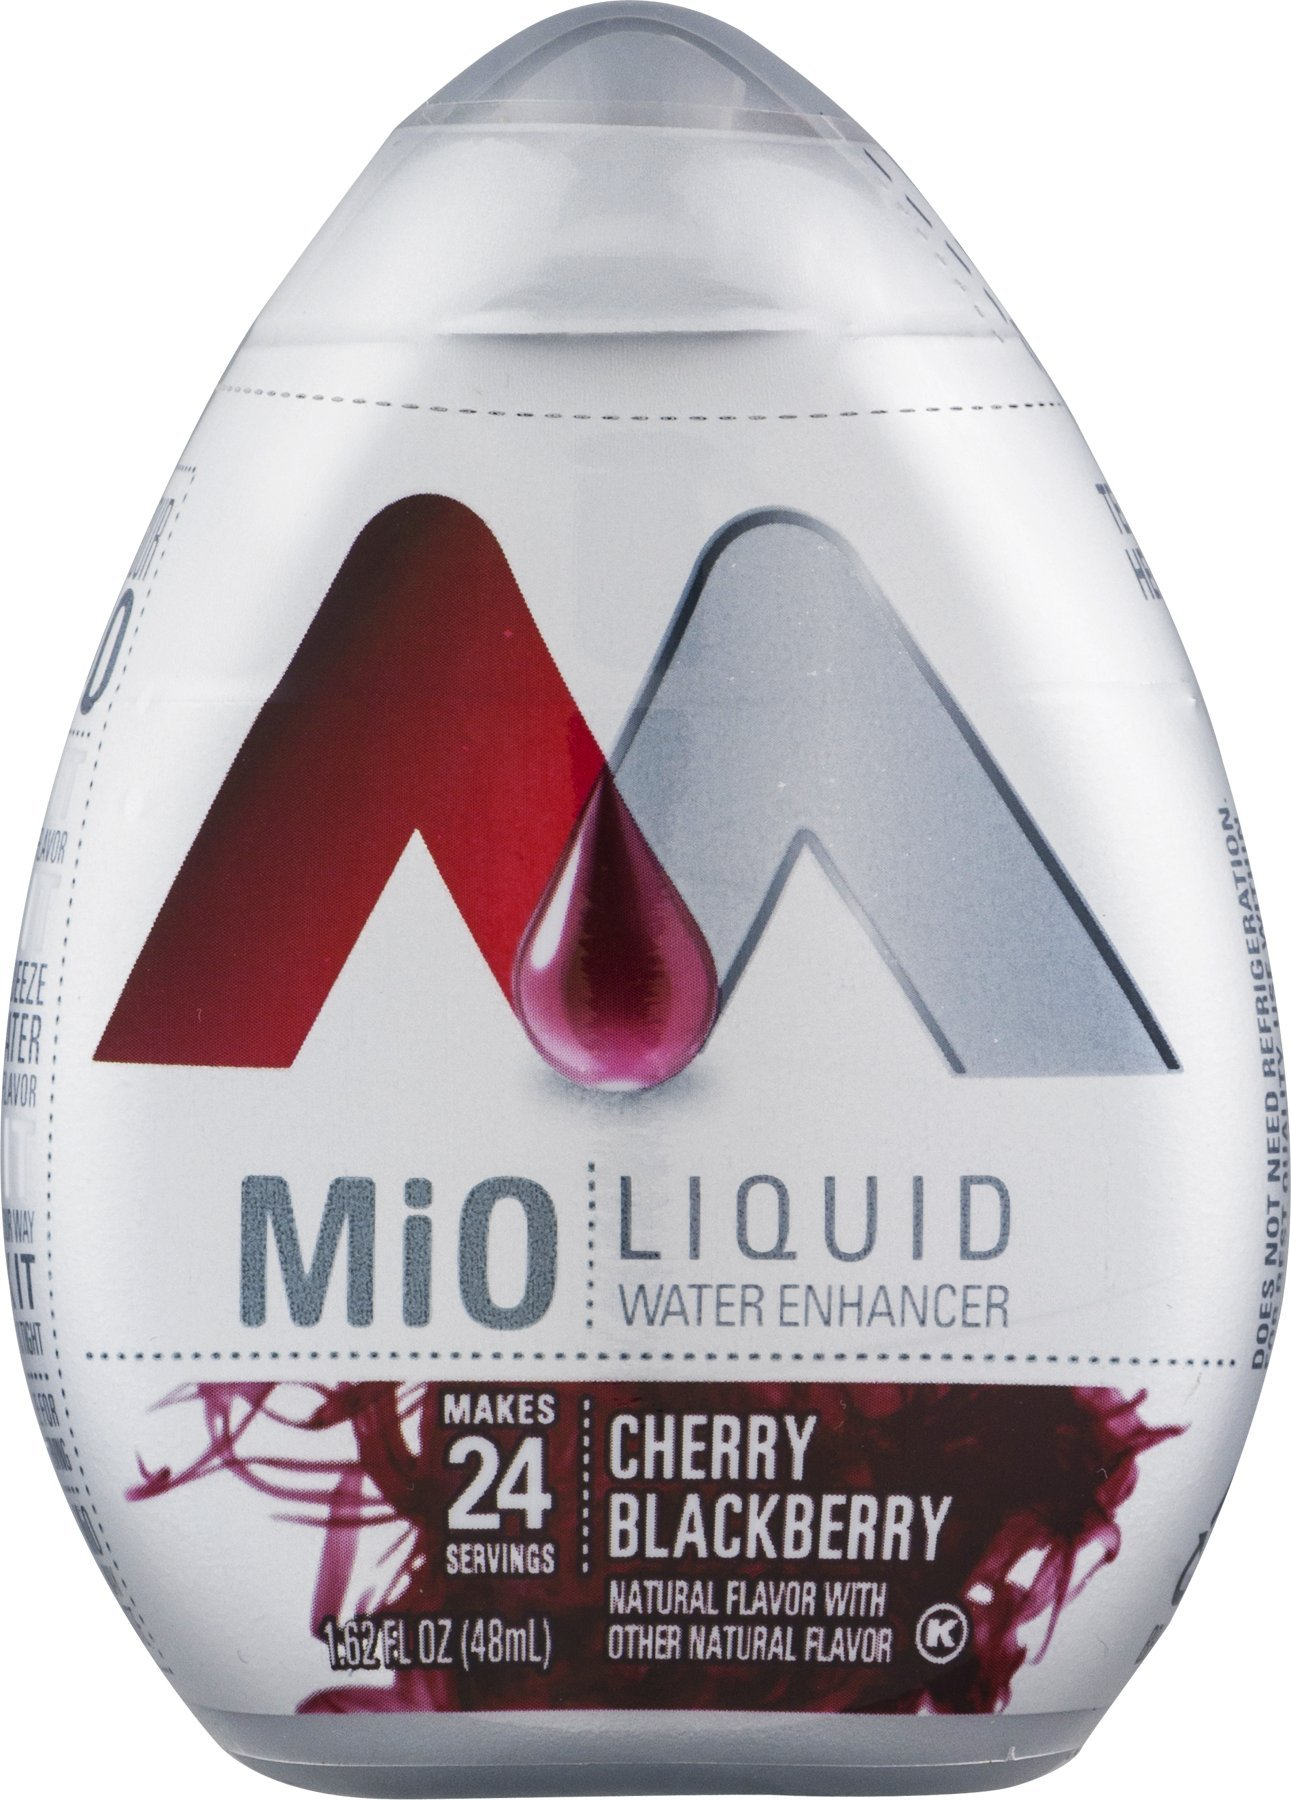 MIO Cherry Blackberry Liquid Water Enhancer pack of 2